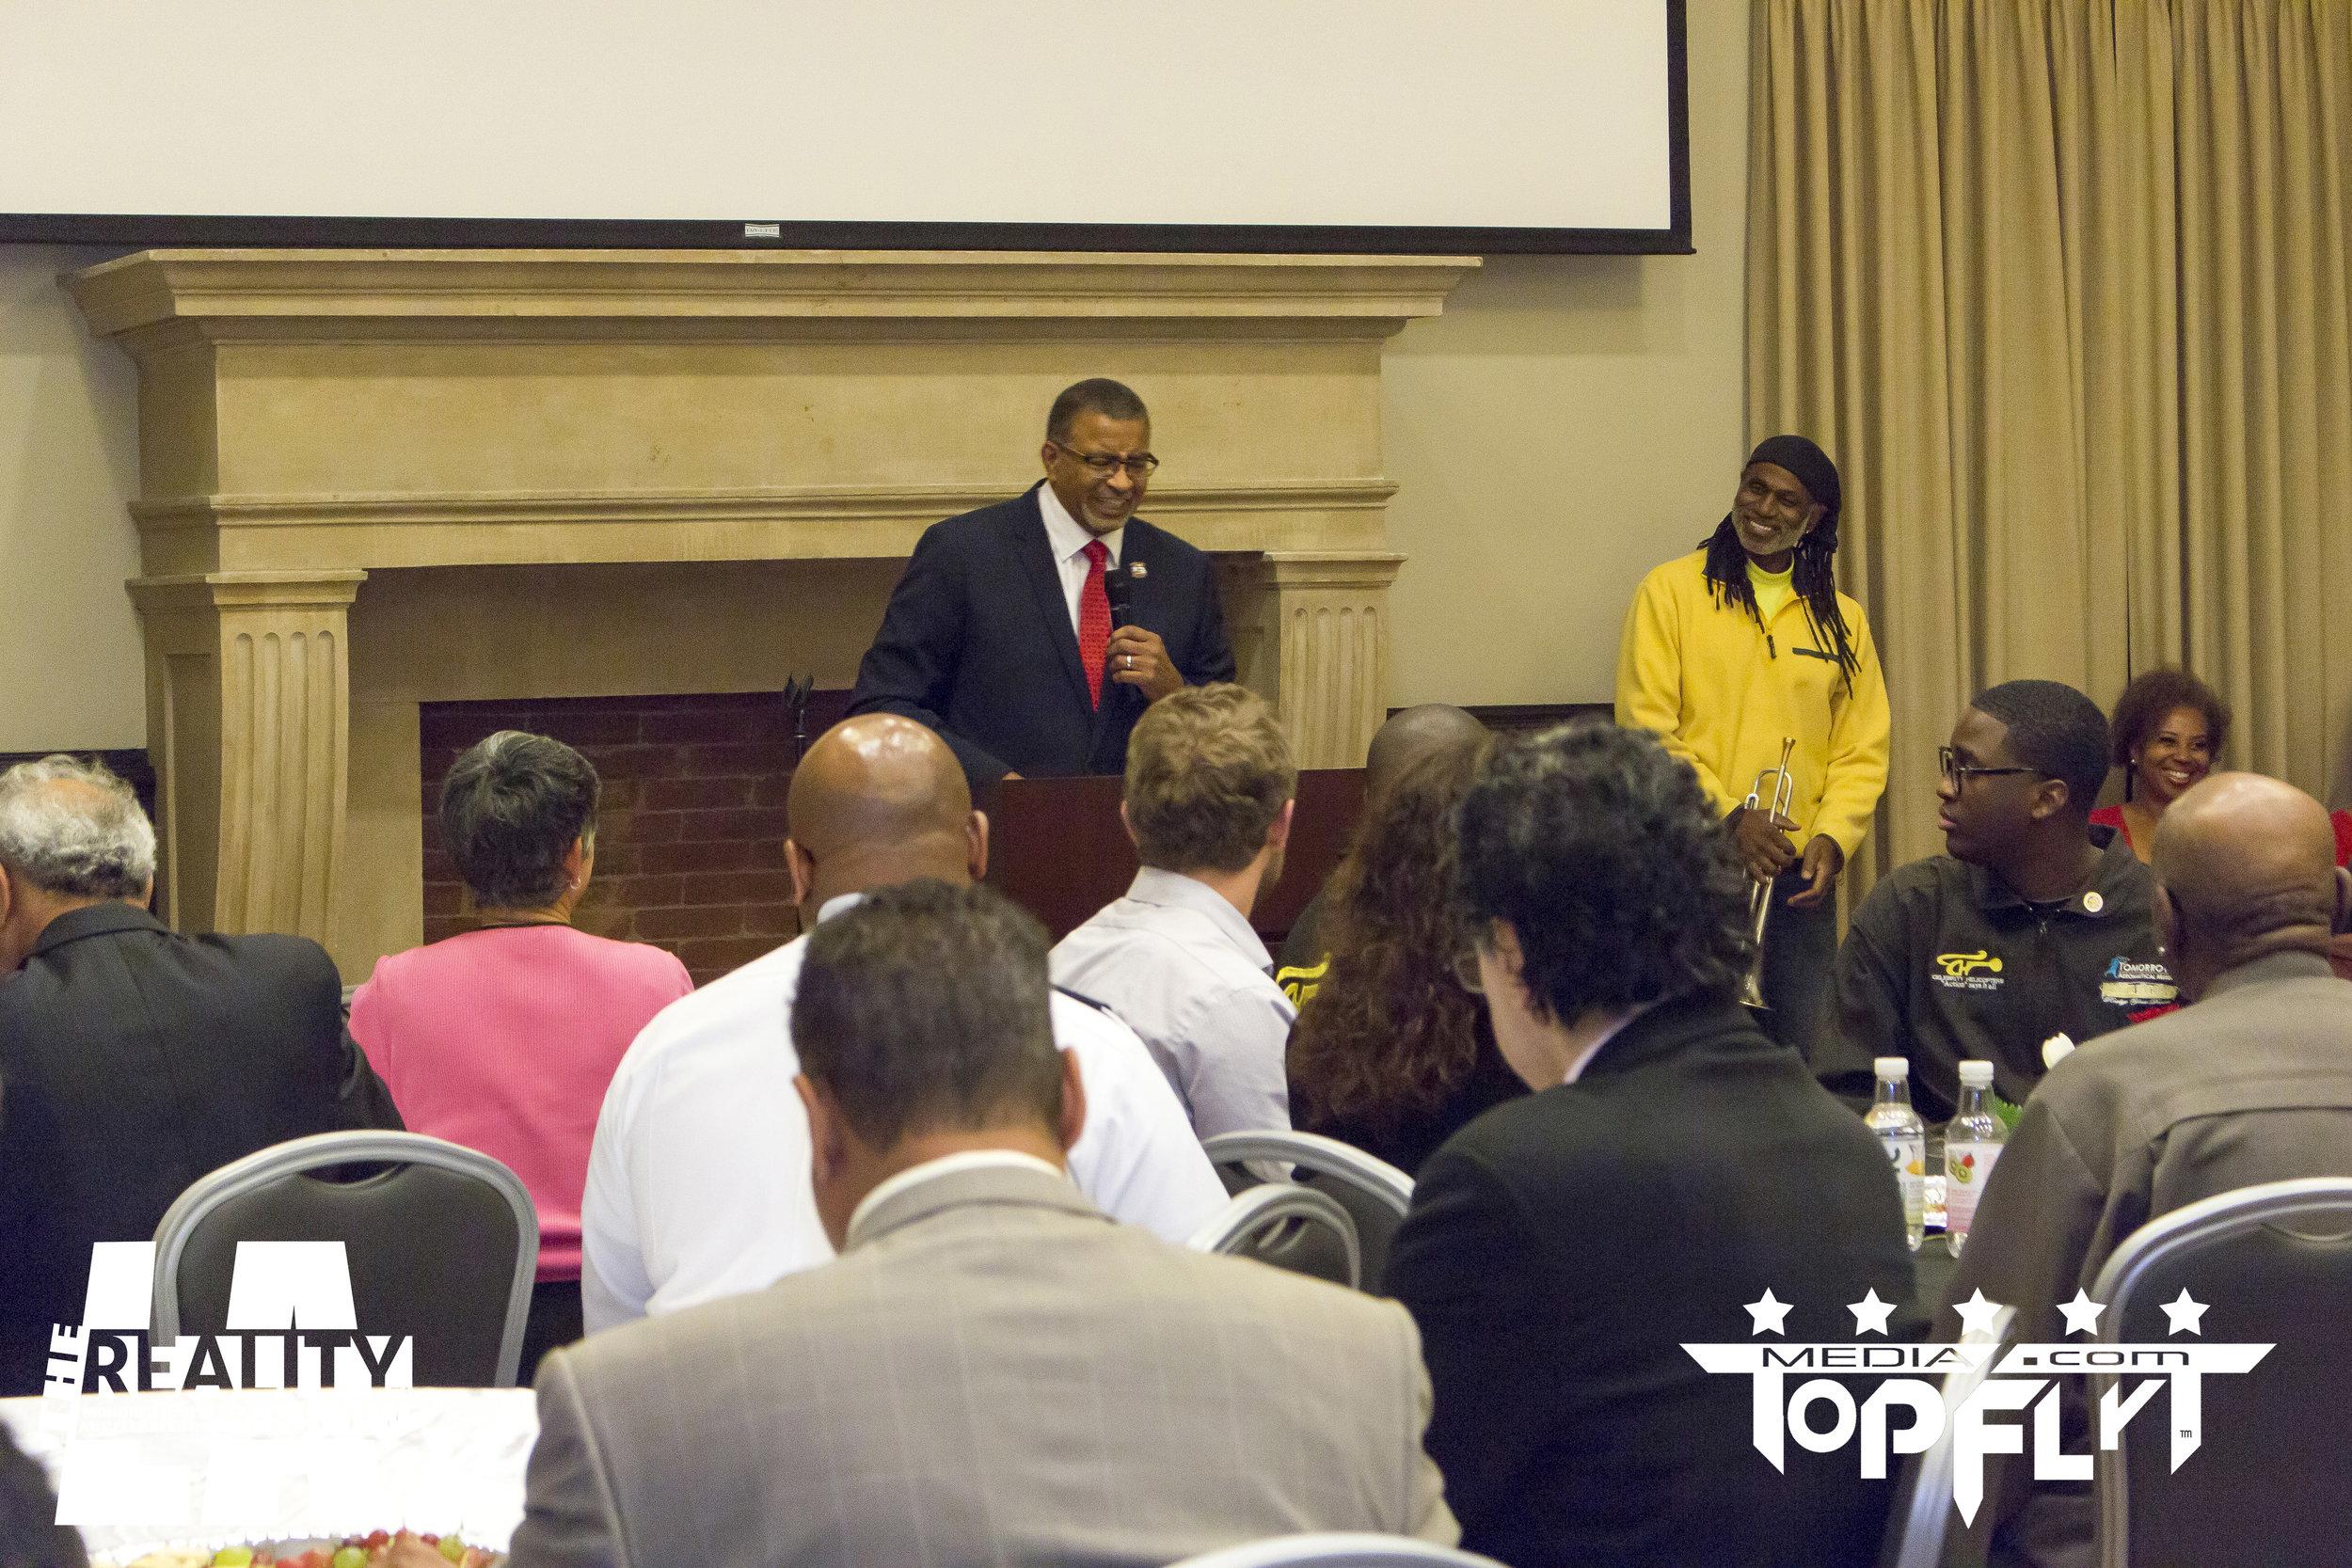 The Reality Show LA - Tuskegee Airmen 75th Anniversary VIP Reception_76.jpg